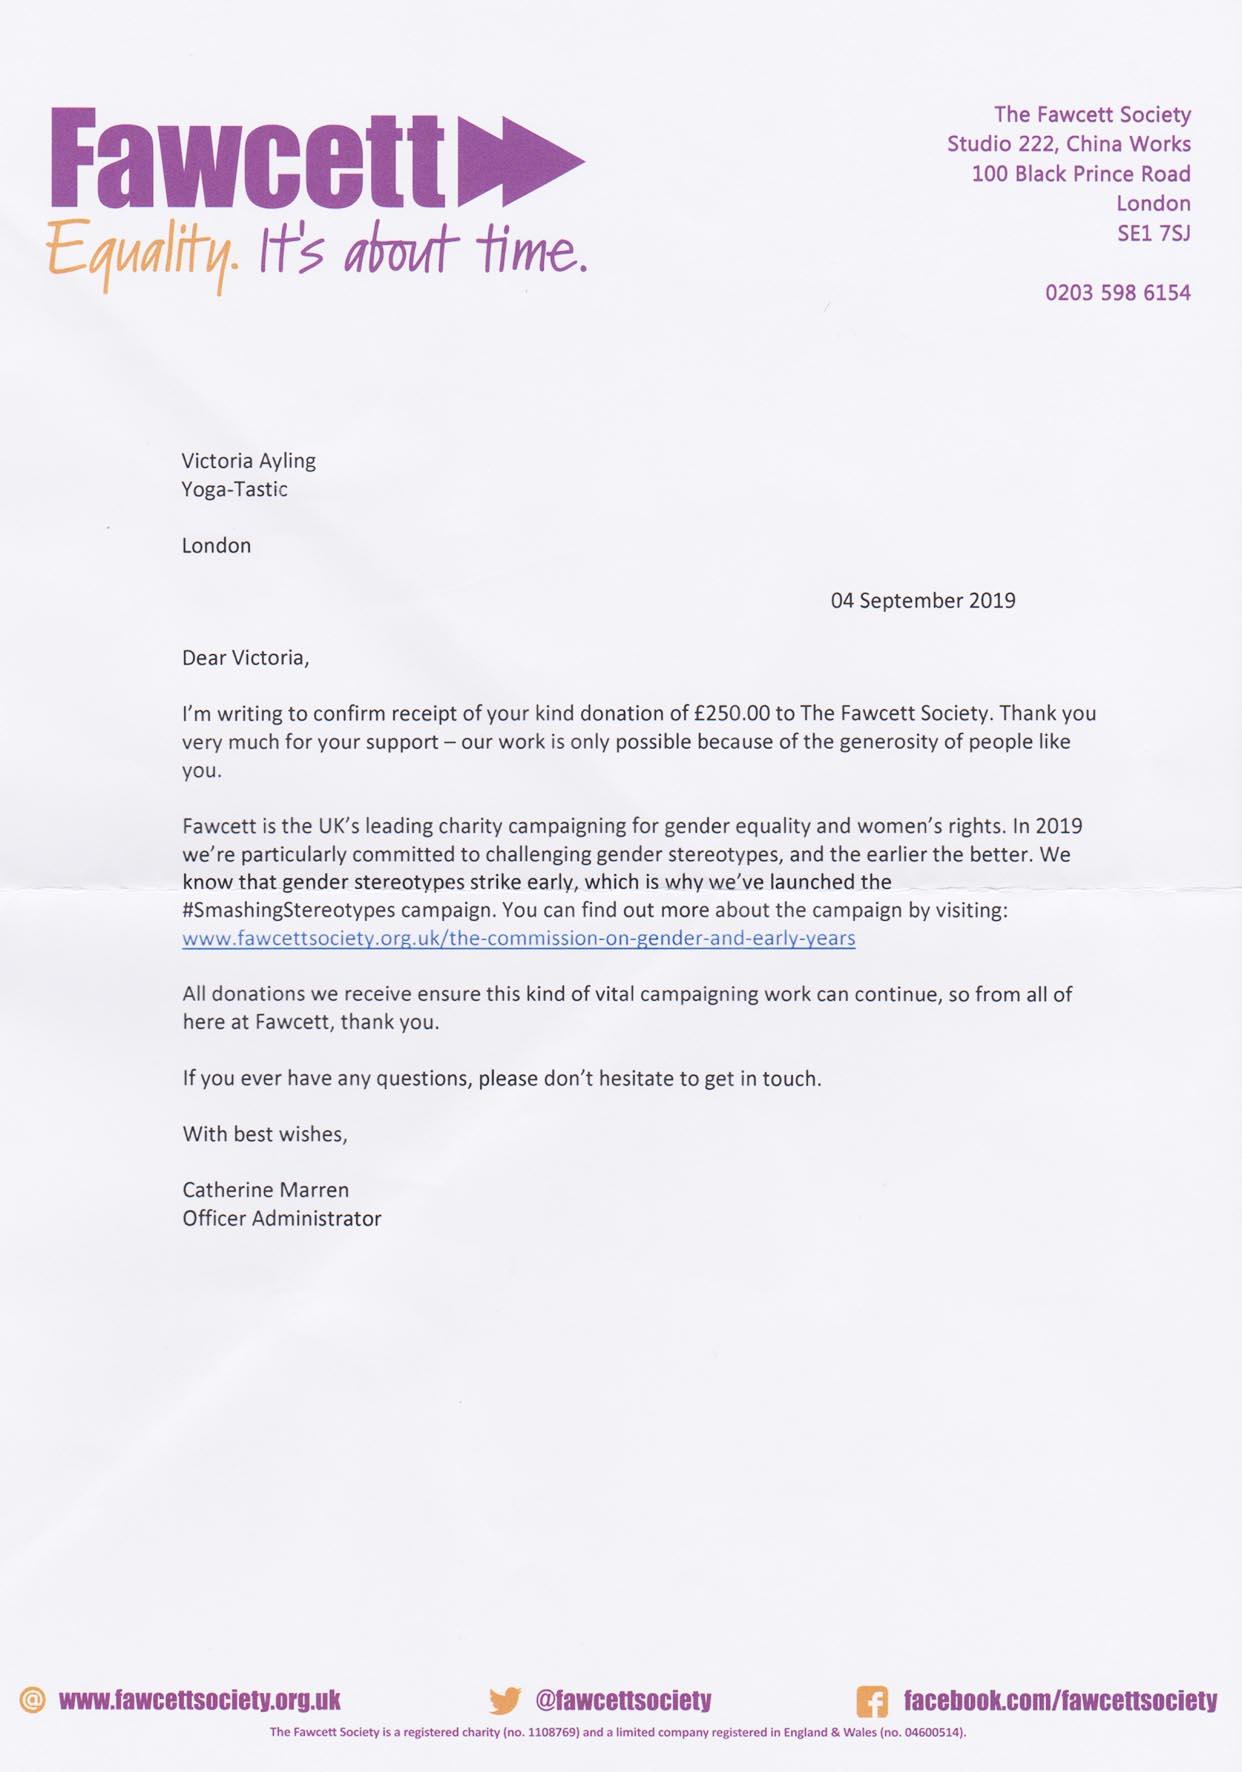 Thank you Letter from Fawcett.jpg